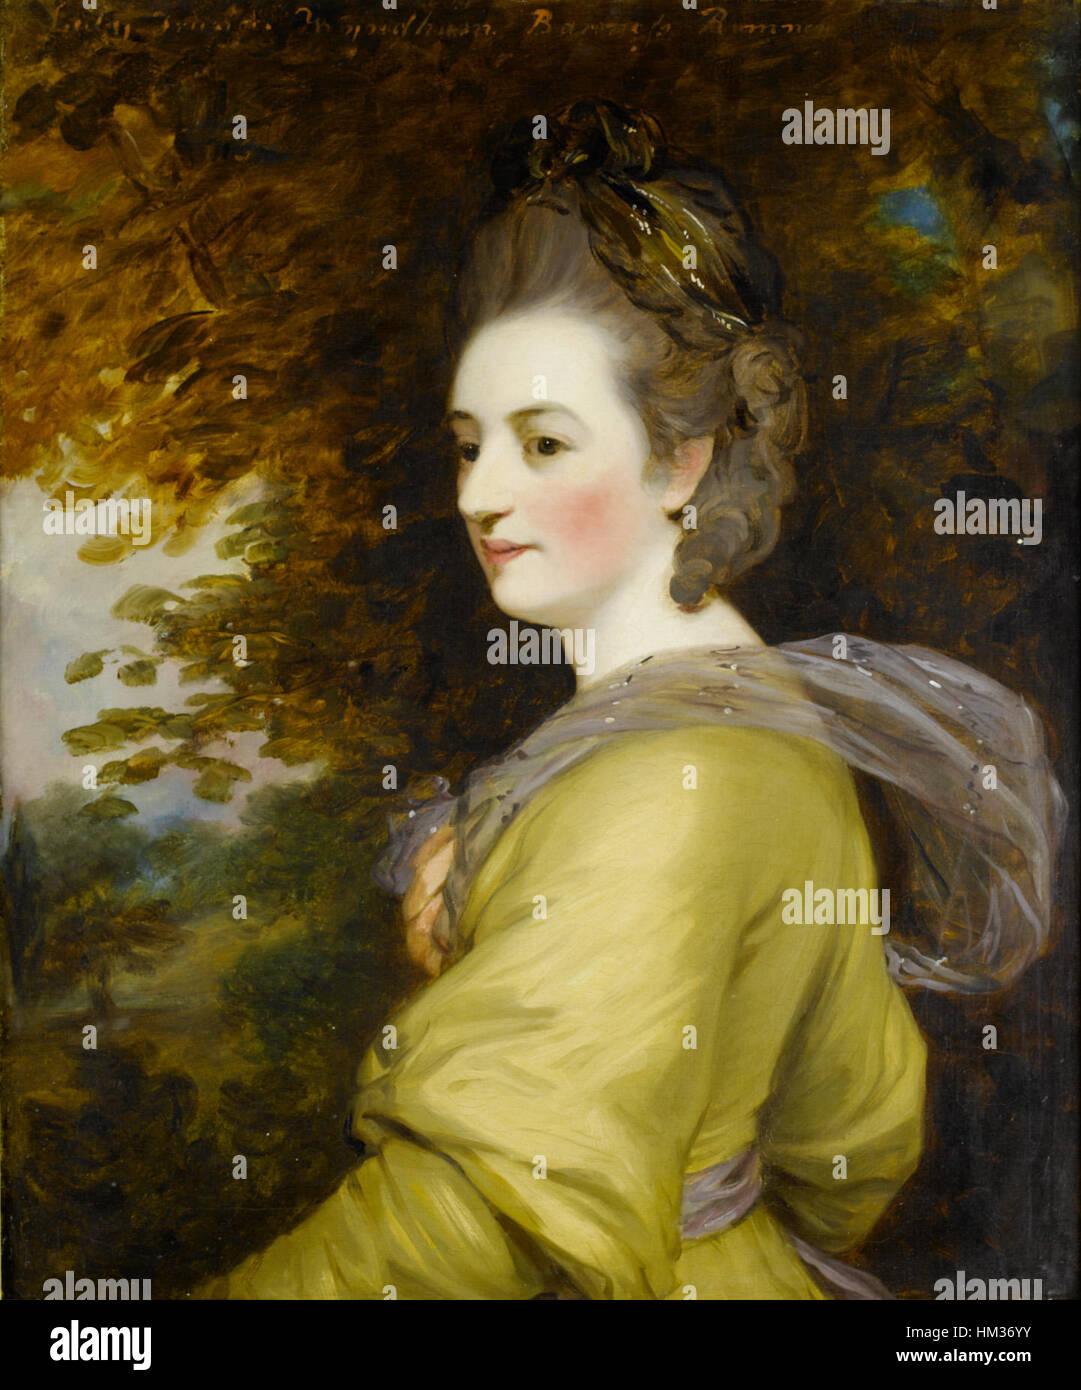 Lady Frances Wyndham, attributed to John Hoppner - Stock Image